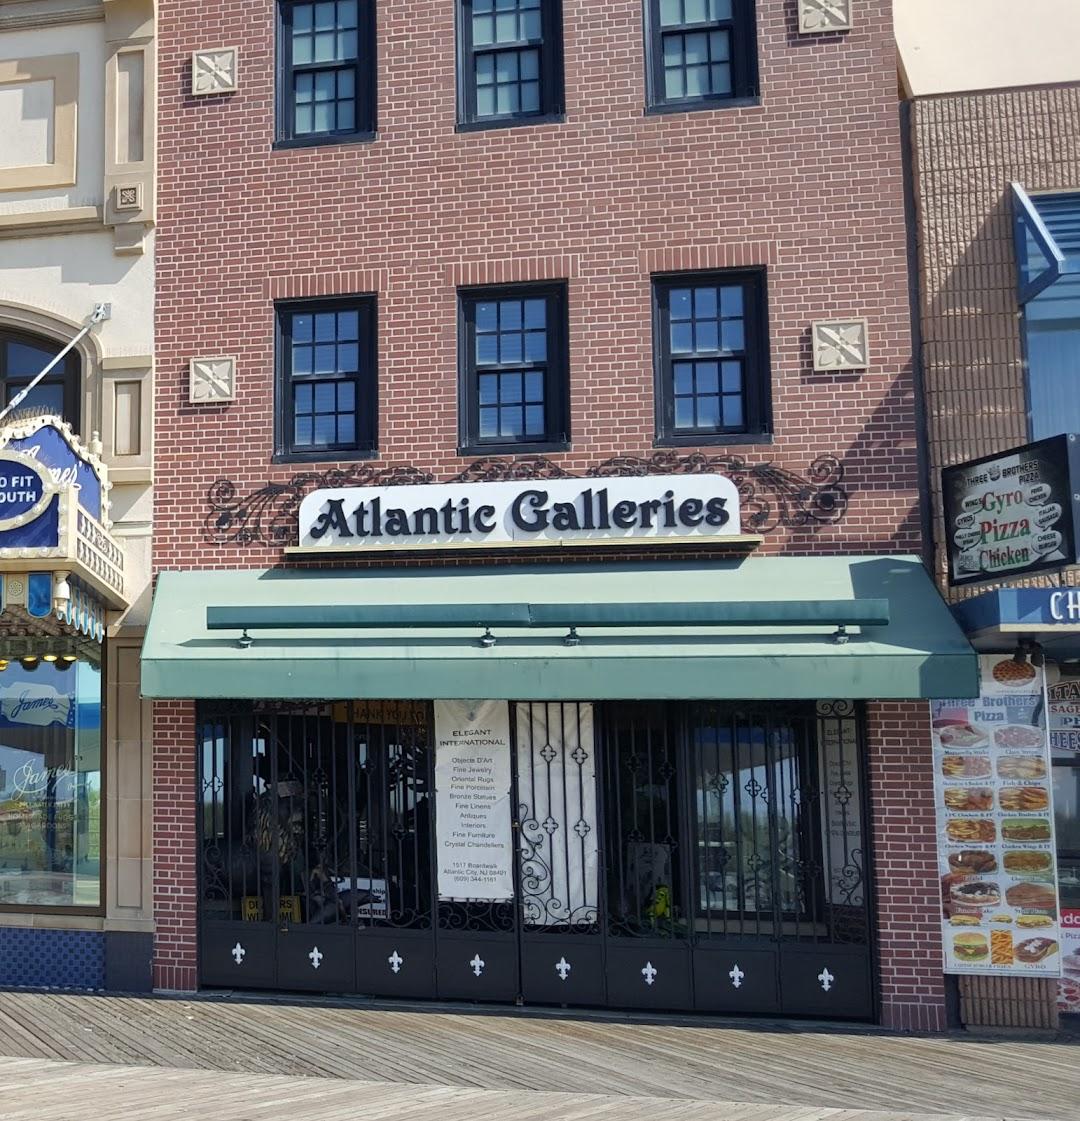 Atlantic Galleries